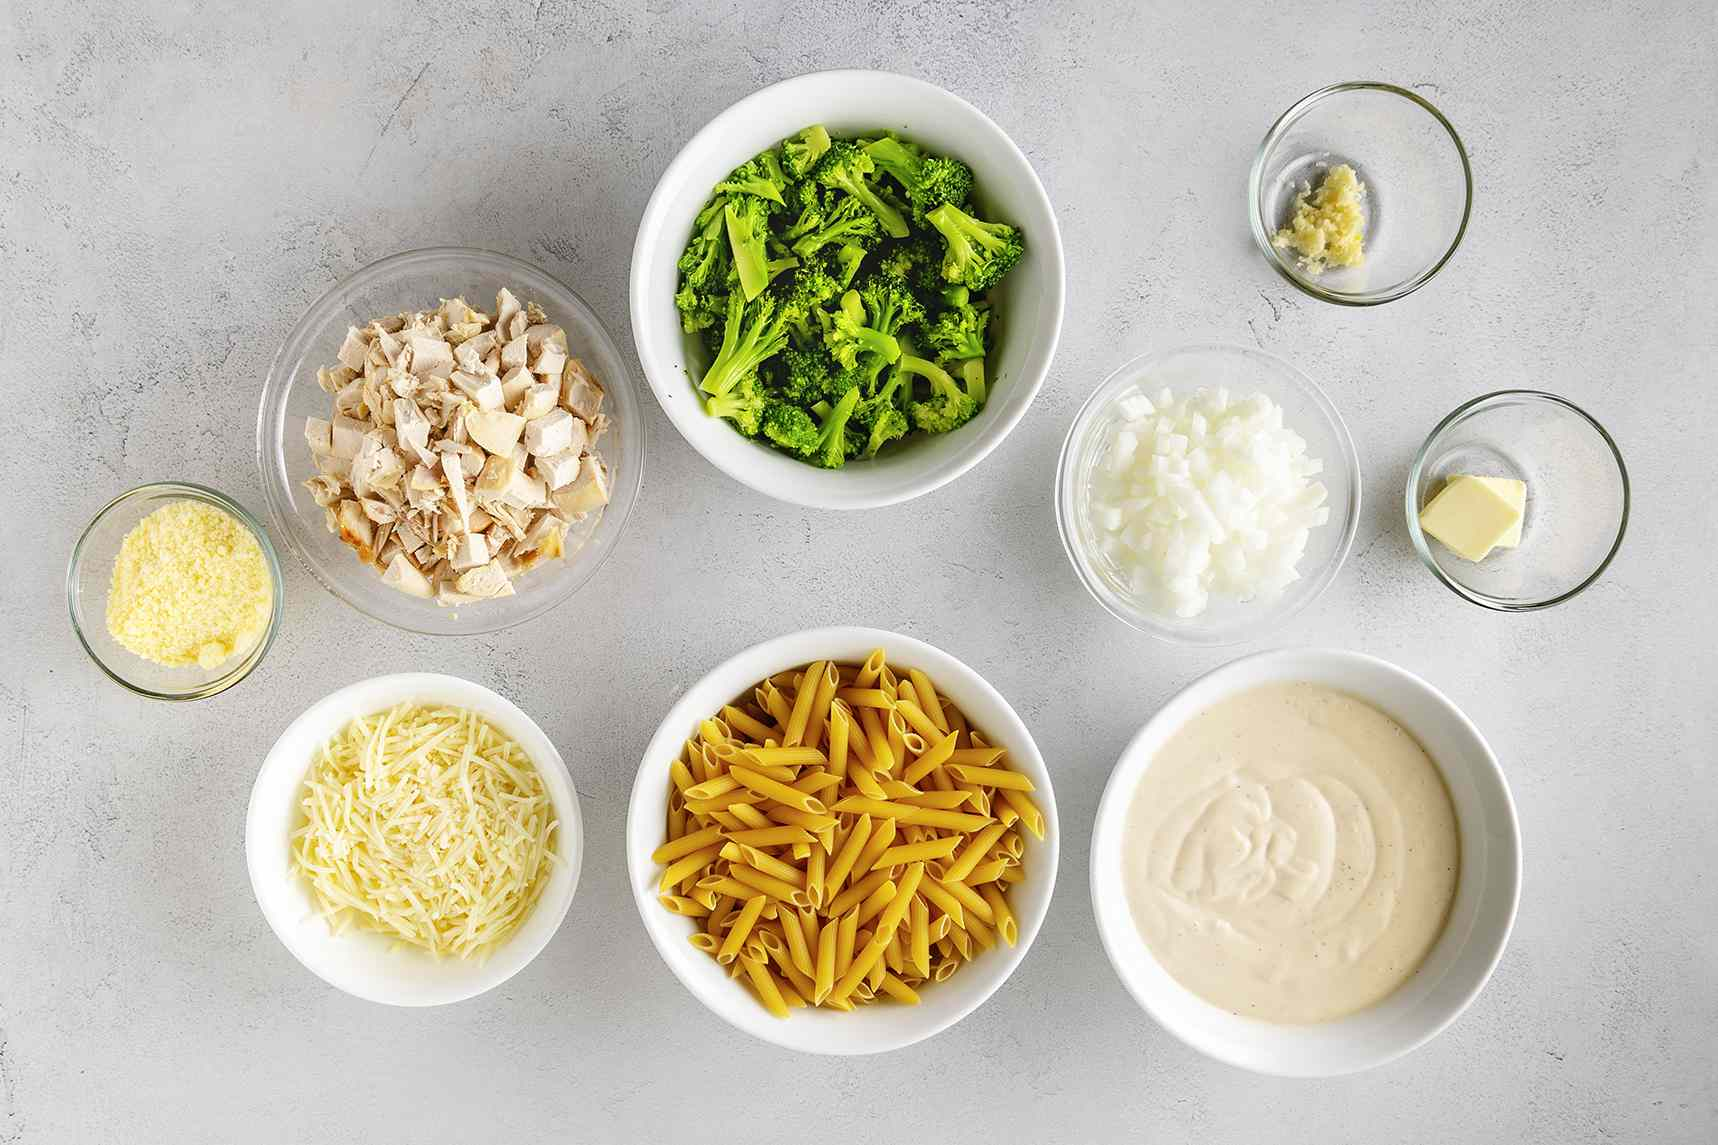 Ingredients for chicken broccoli ziti alfredo bake